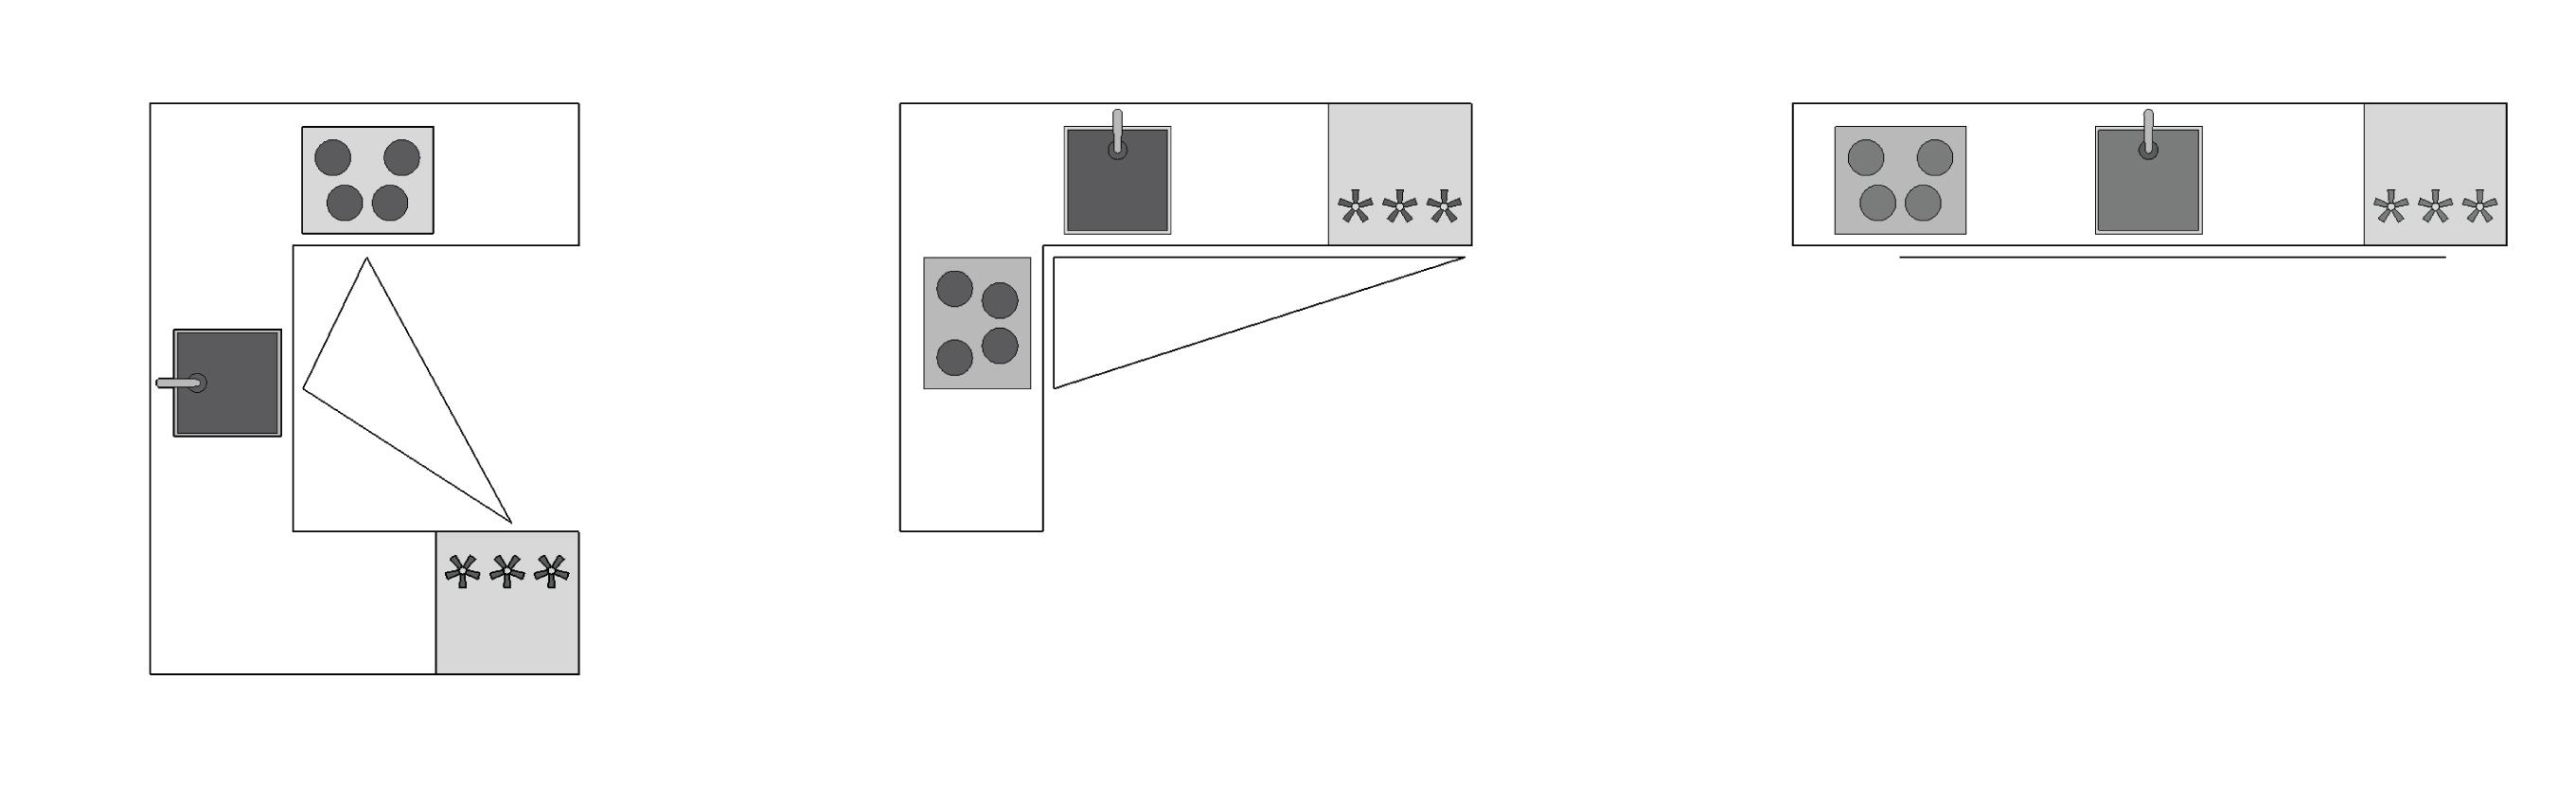 Keuken driehoek, keuken ergonomie